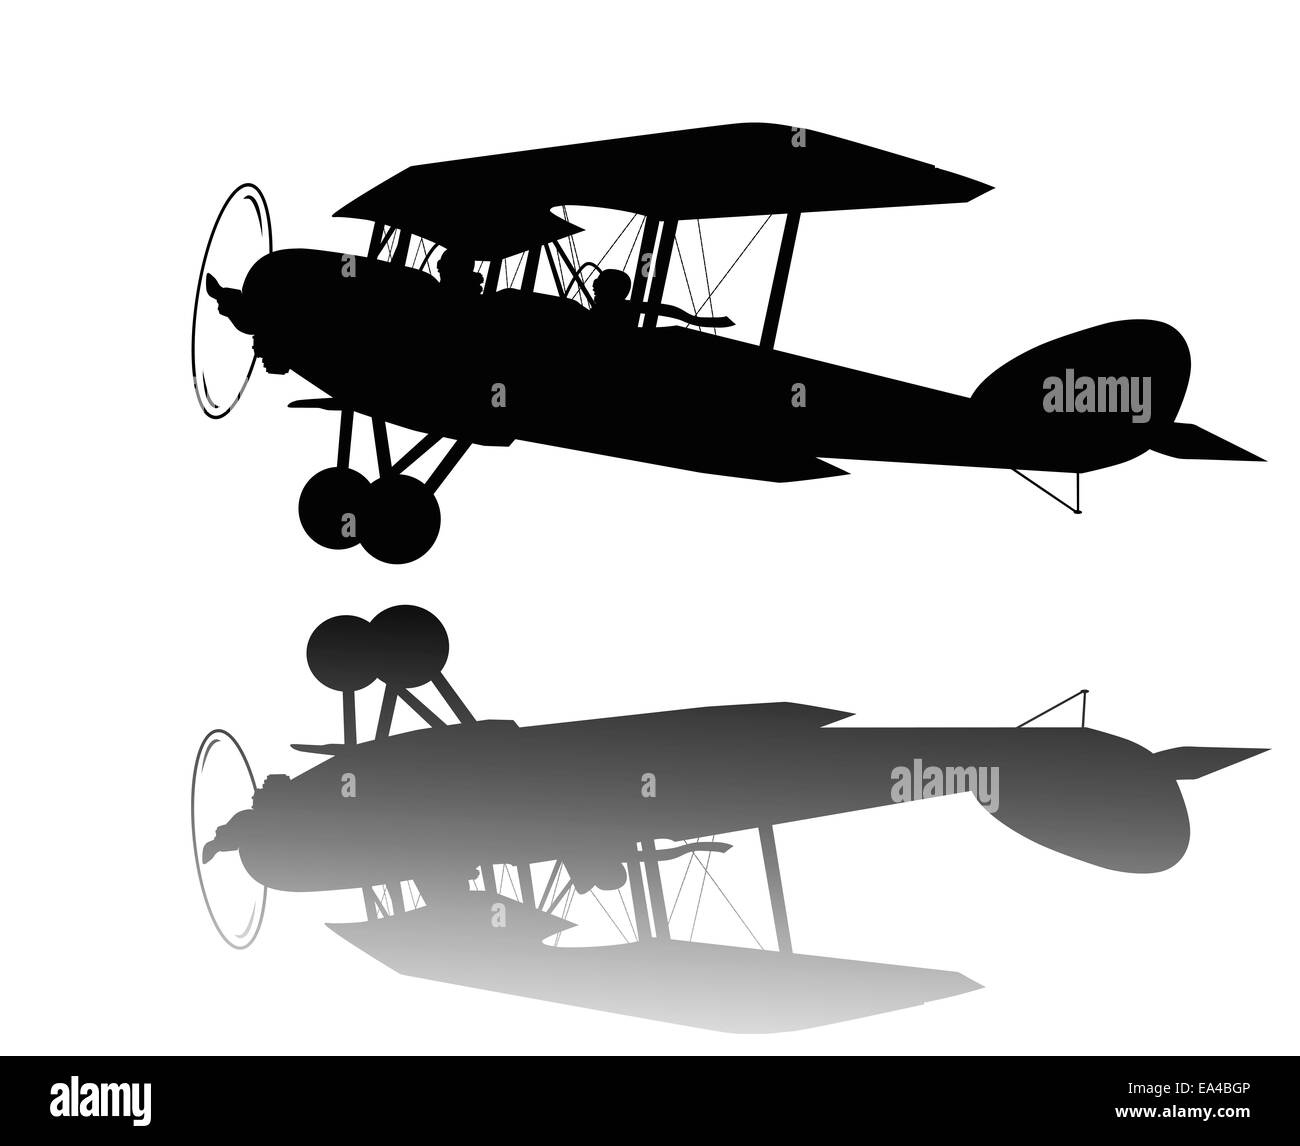 Vintage airplane - Stock Image